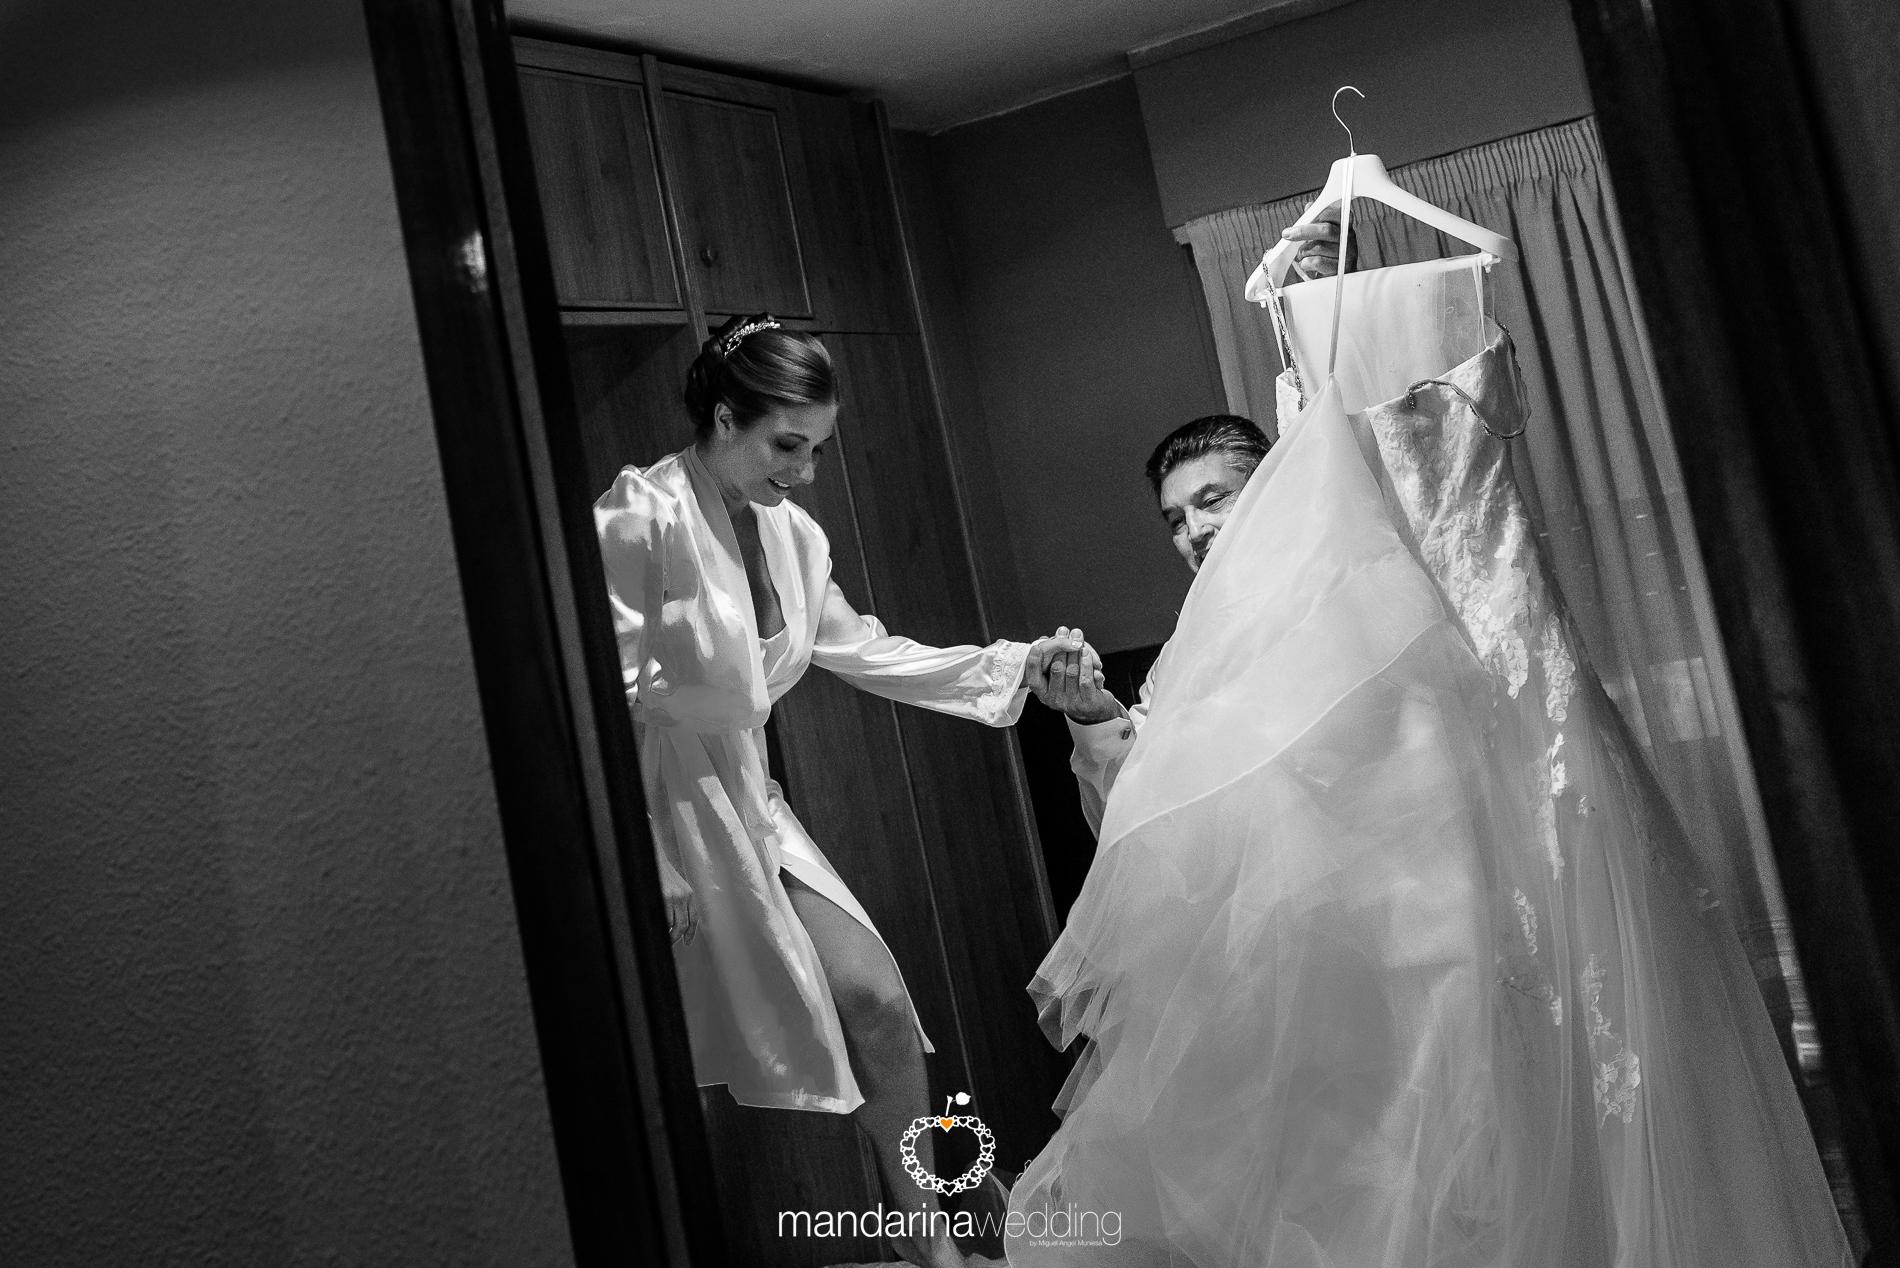 mandarina wedding, mejores fotografos boda, fotografo zaragoza, fotografo huesca, fotografo soria, fotografo lerida_45